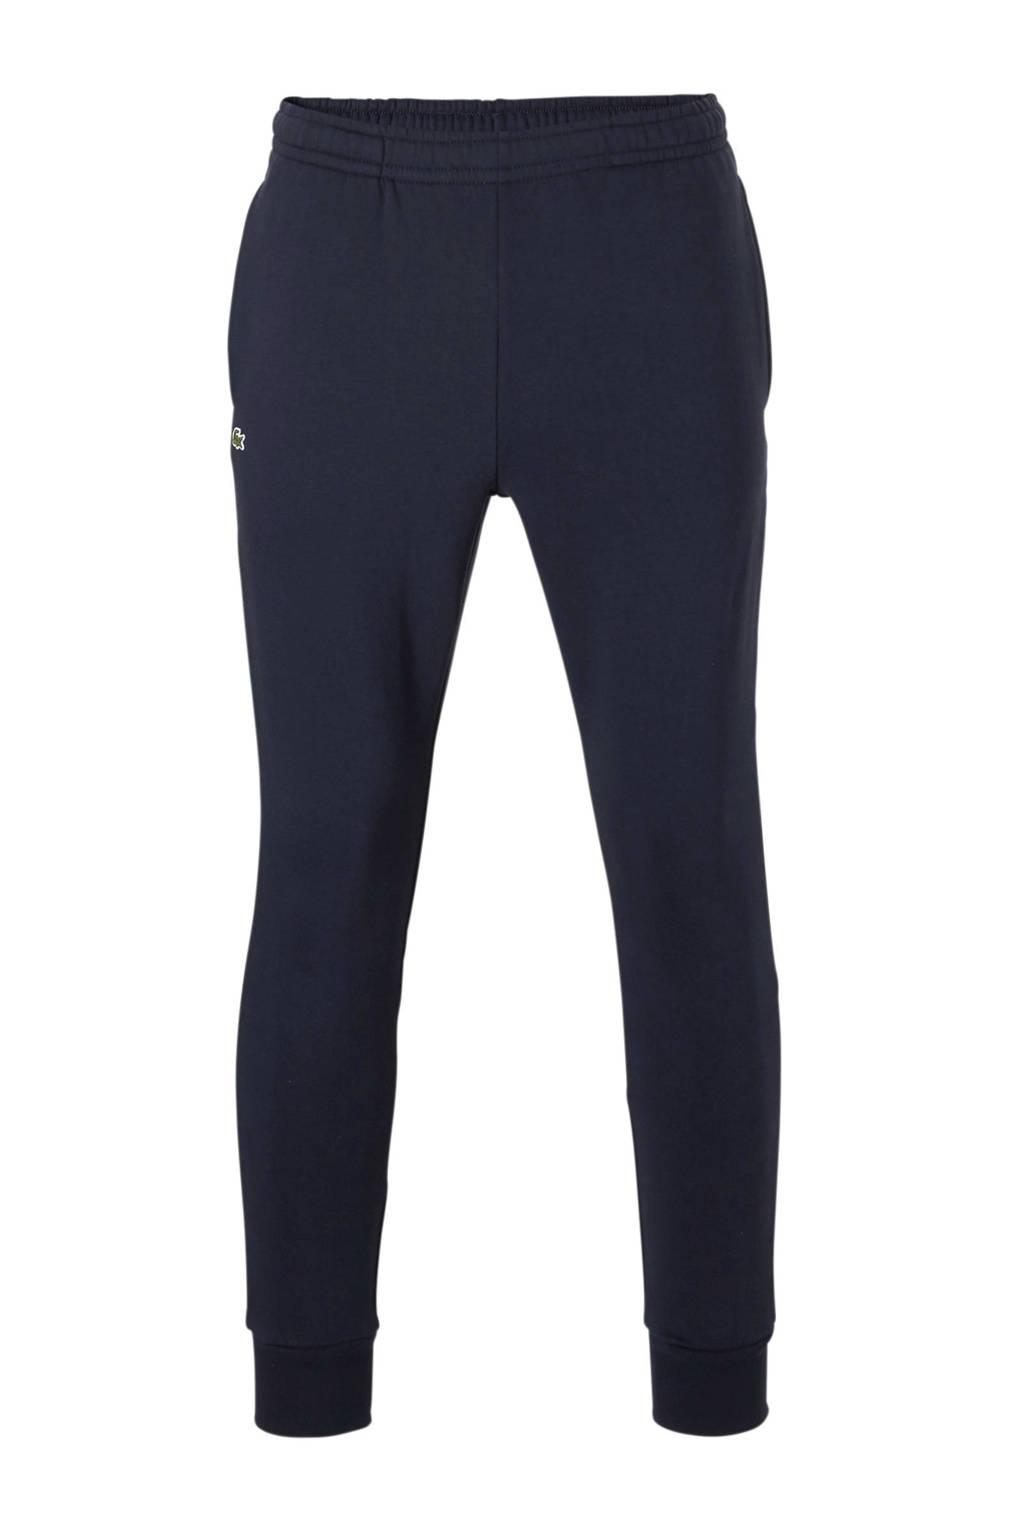 Lacoste joggingbroek donkerblauw, Donkerblauw